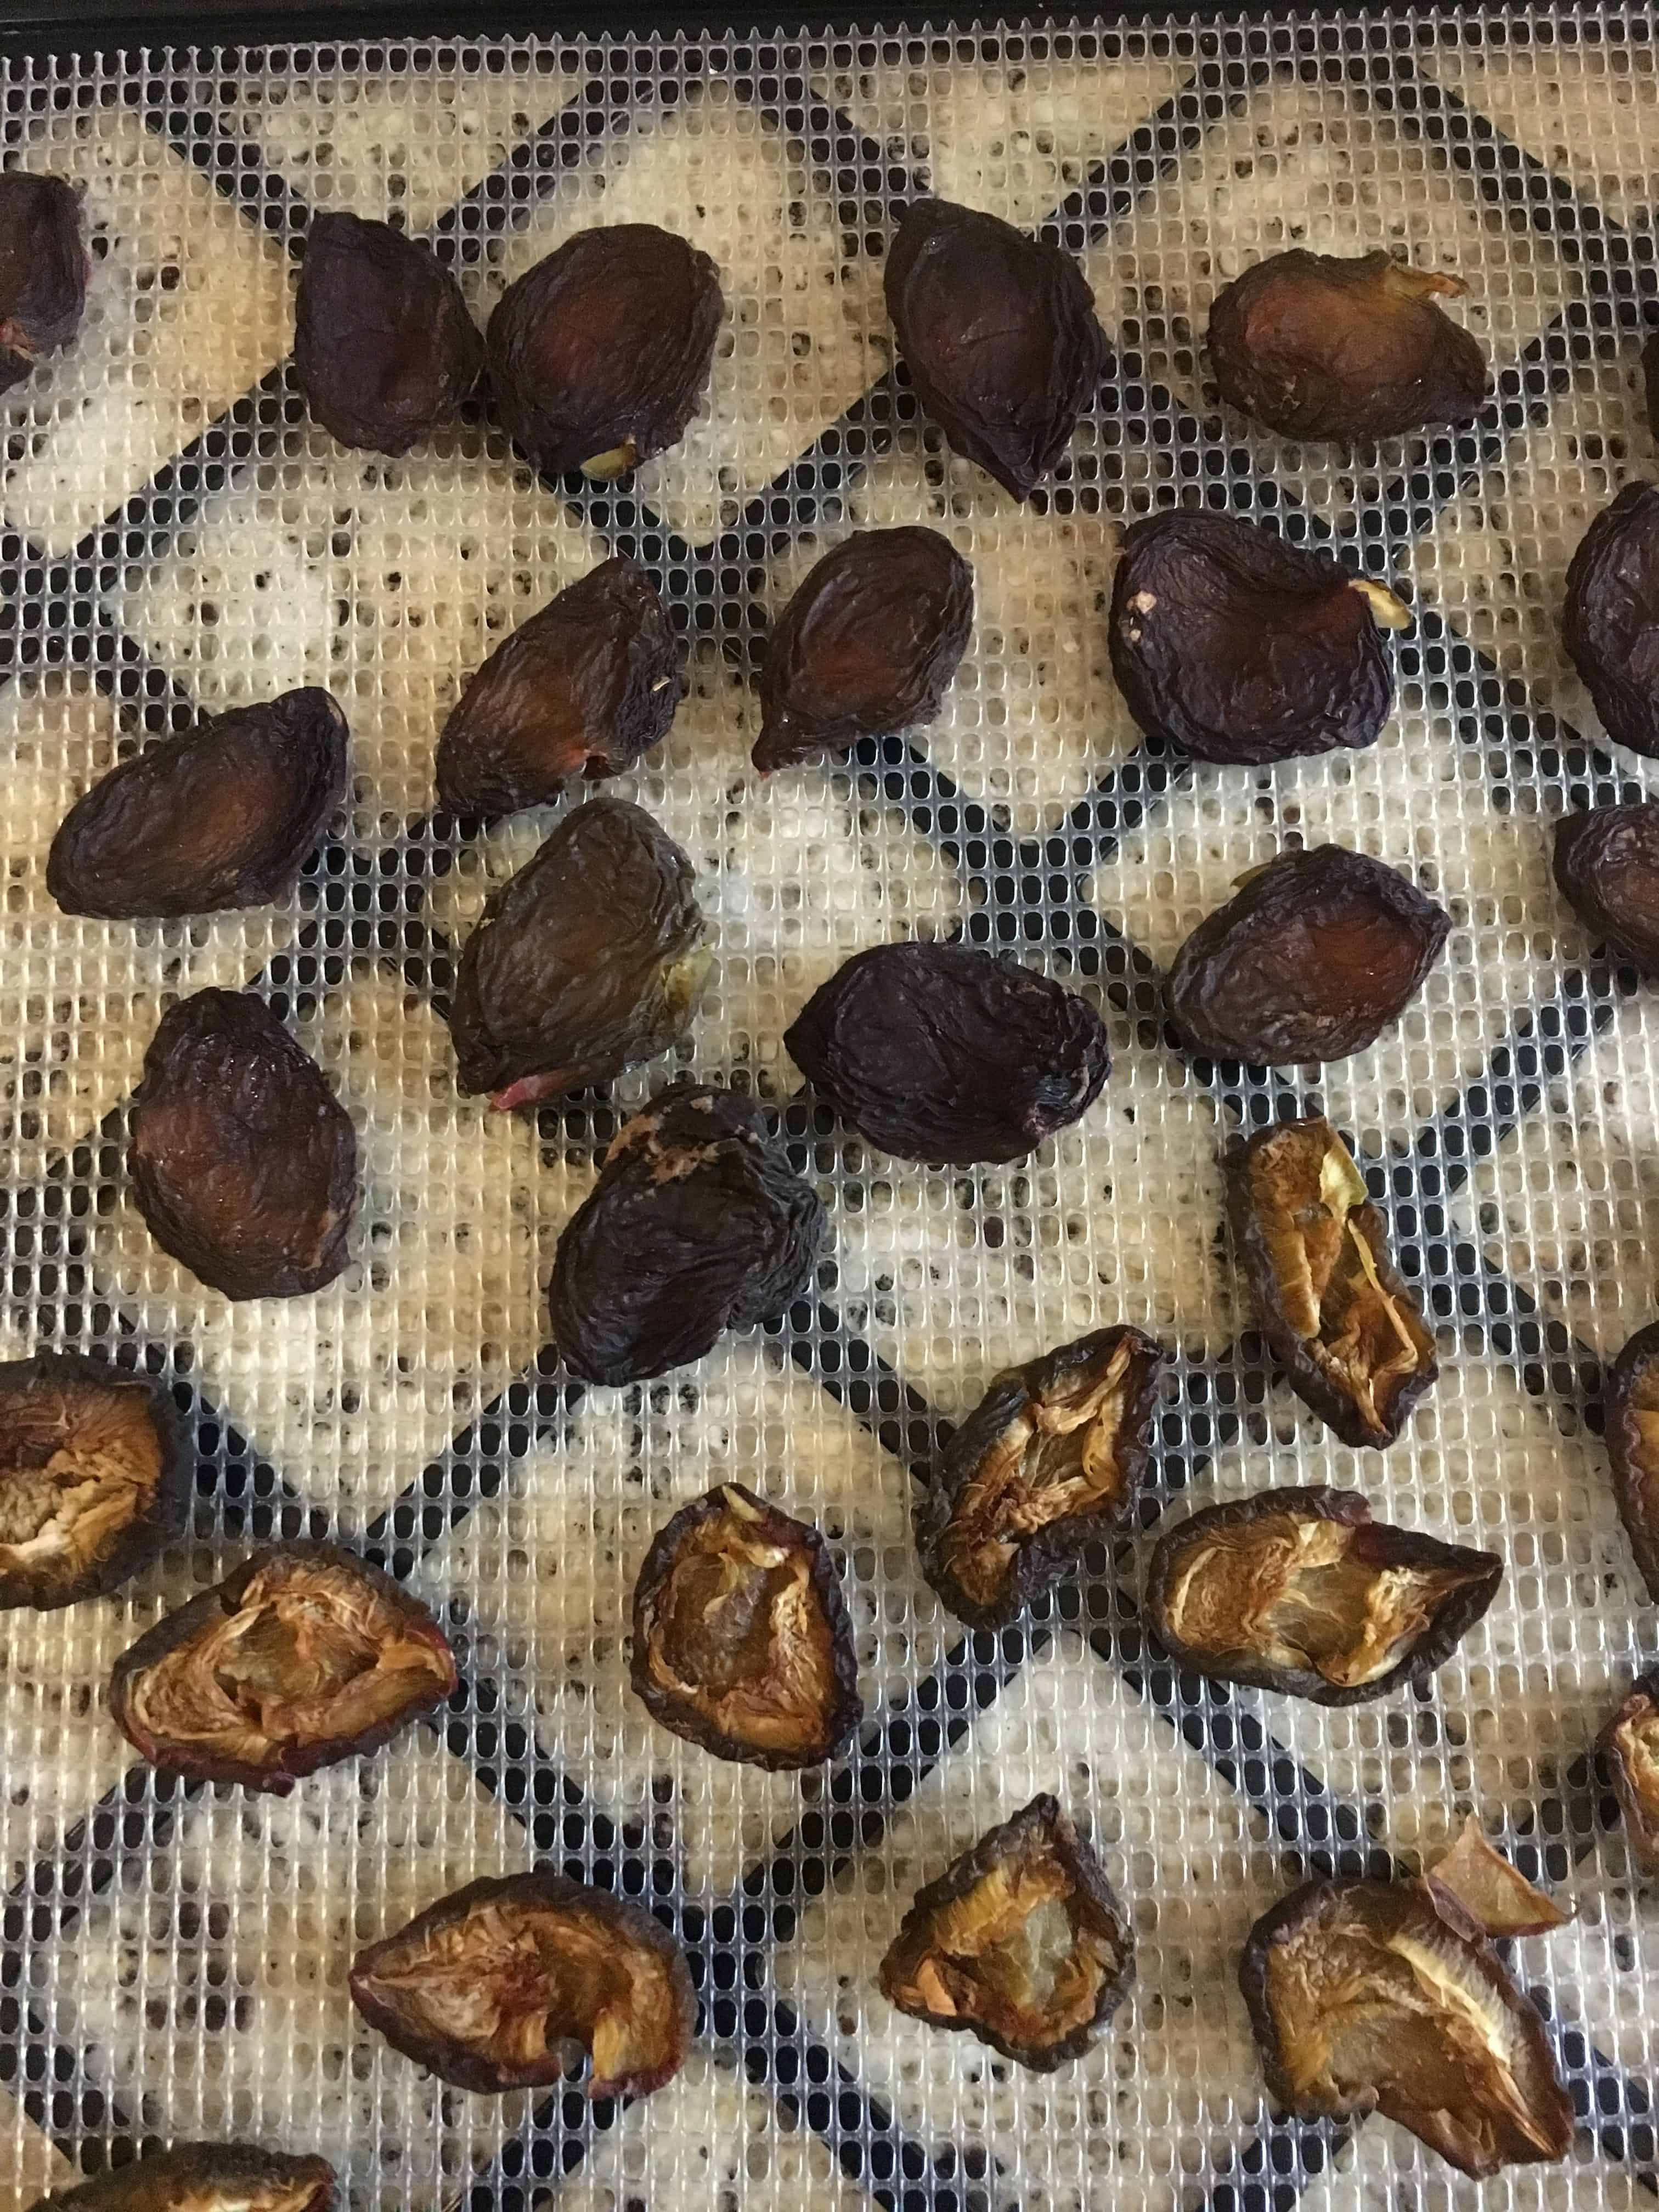 Dried prunes, both sides shown. https://trimazing.com